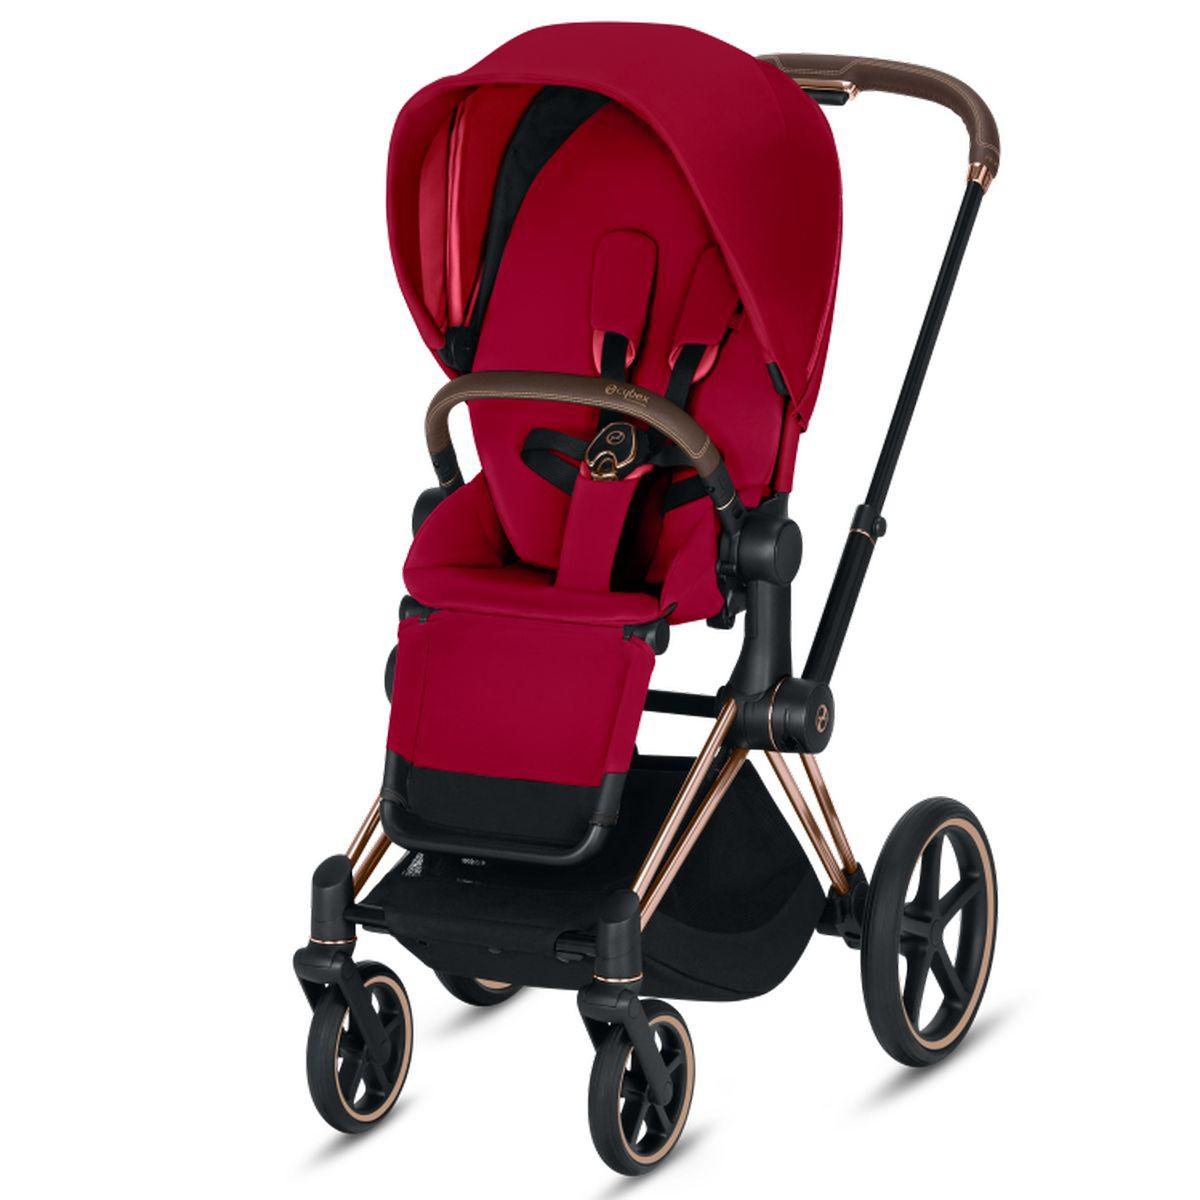 Asiento-pack silla PRIAM Cybex true red-red